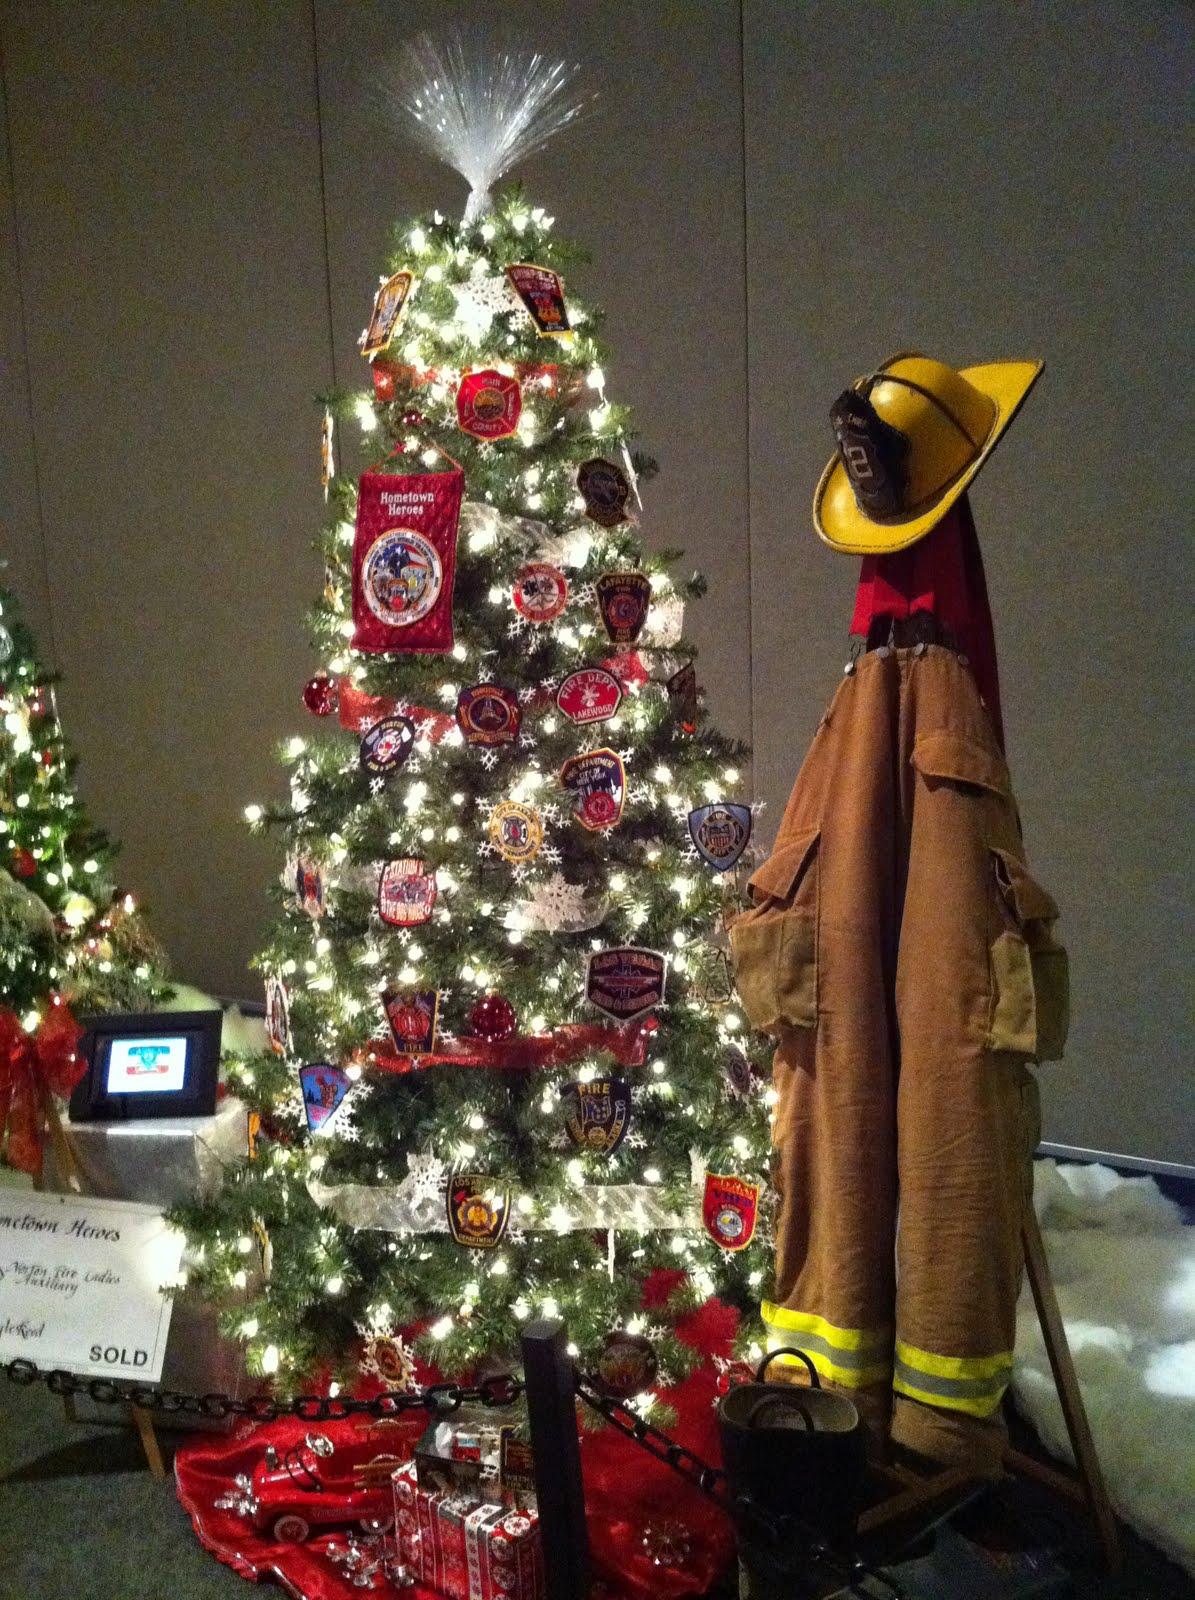 Holiday Tree Festival - Akron | Ohio Festivals inside Univ Of Akron Holidays